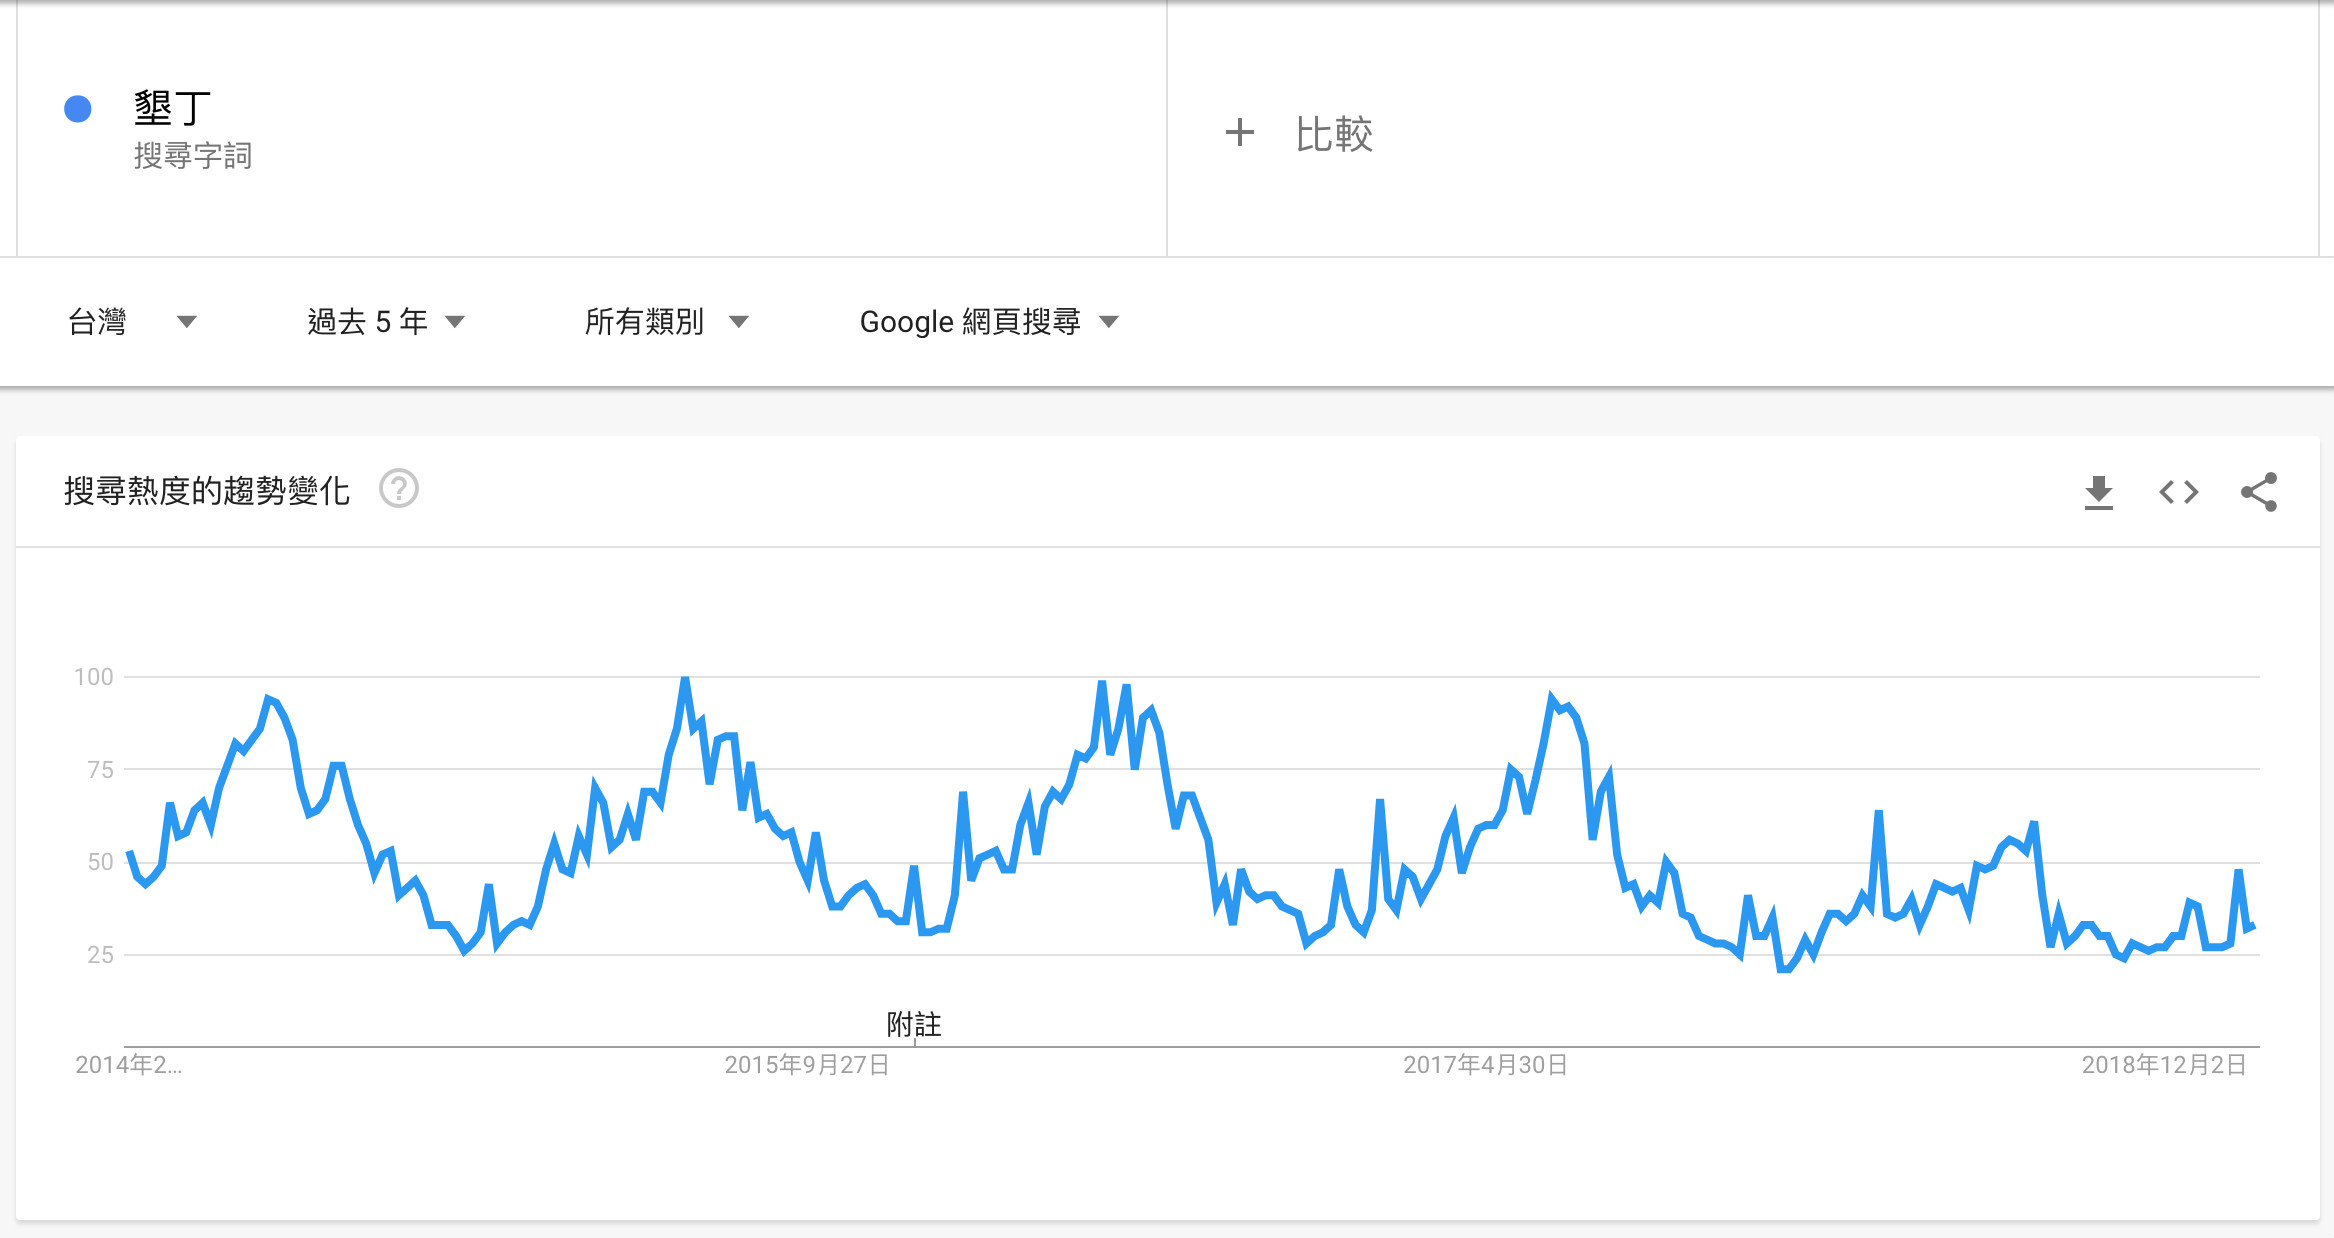 Google 趨勢的季節性變化